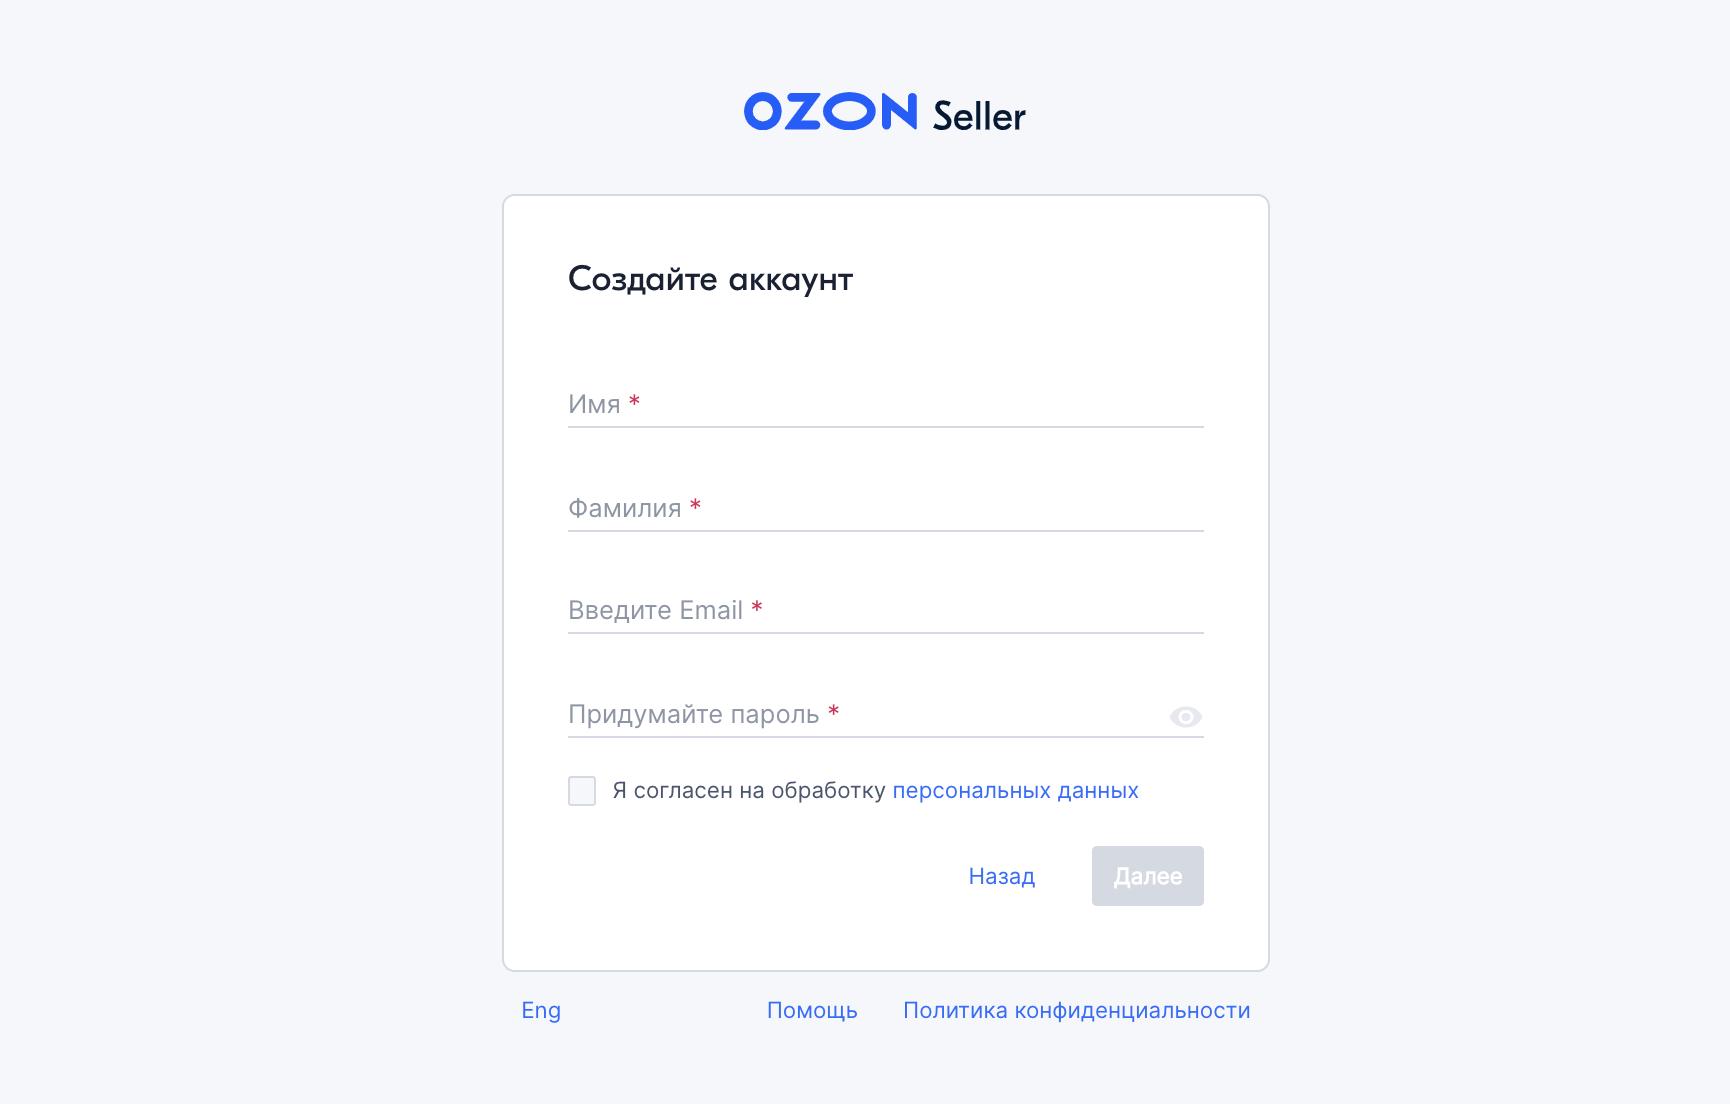 Личный кабинет продавца Ozon Seller - вход